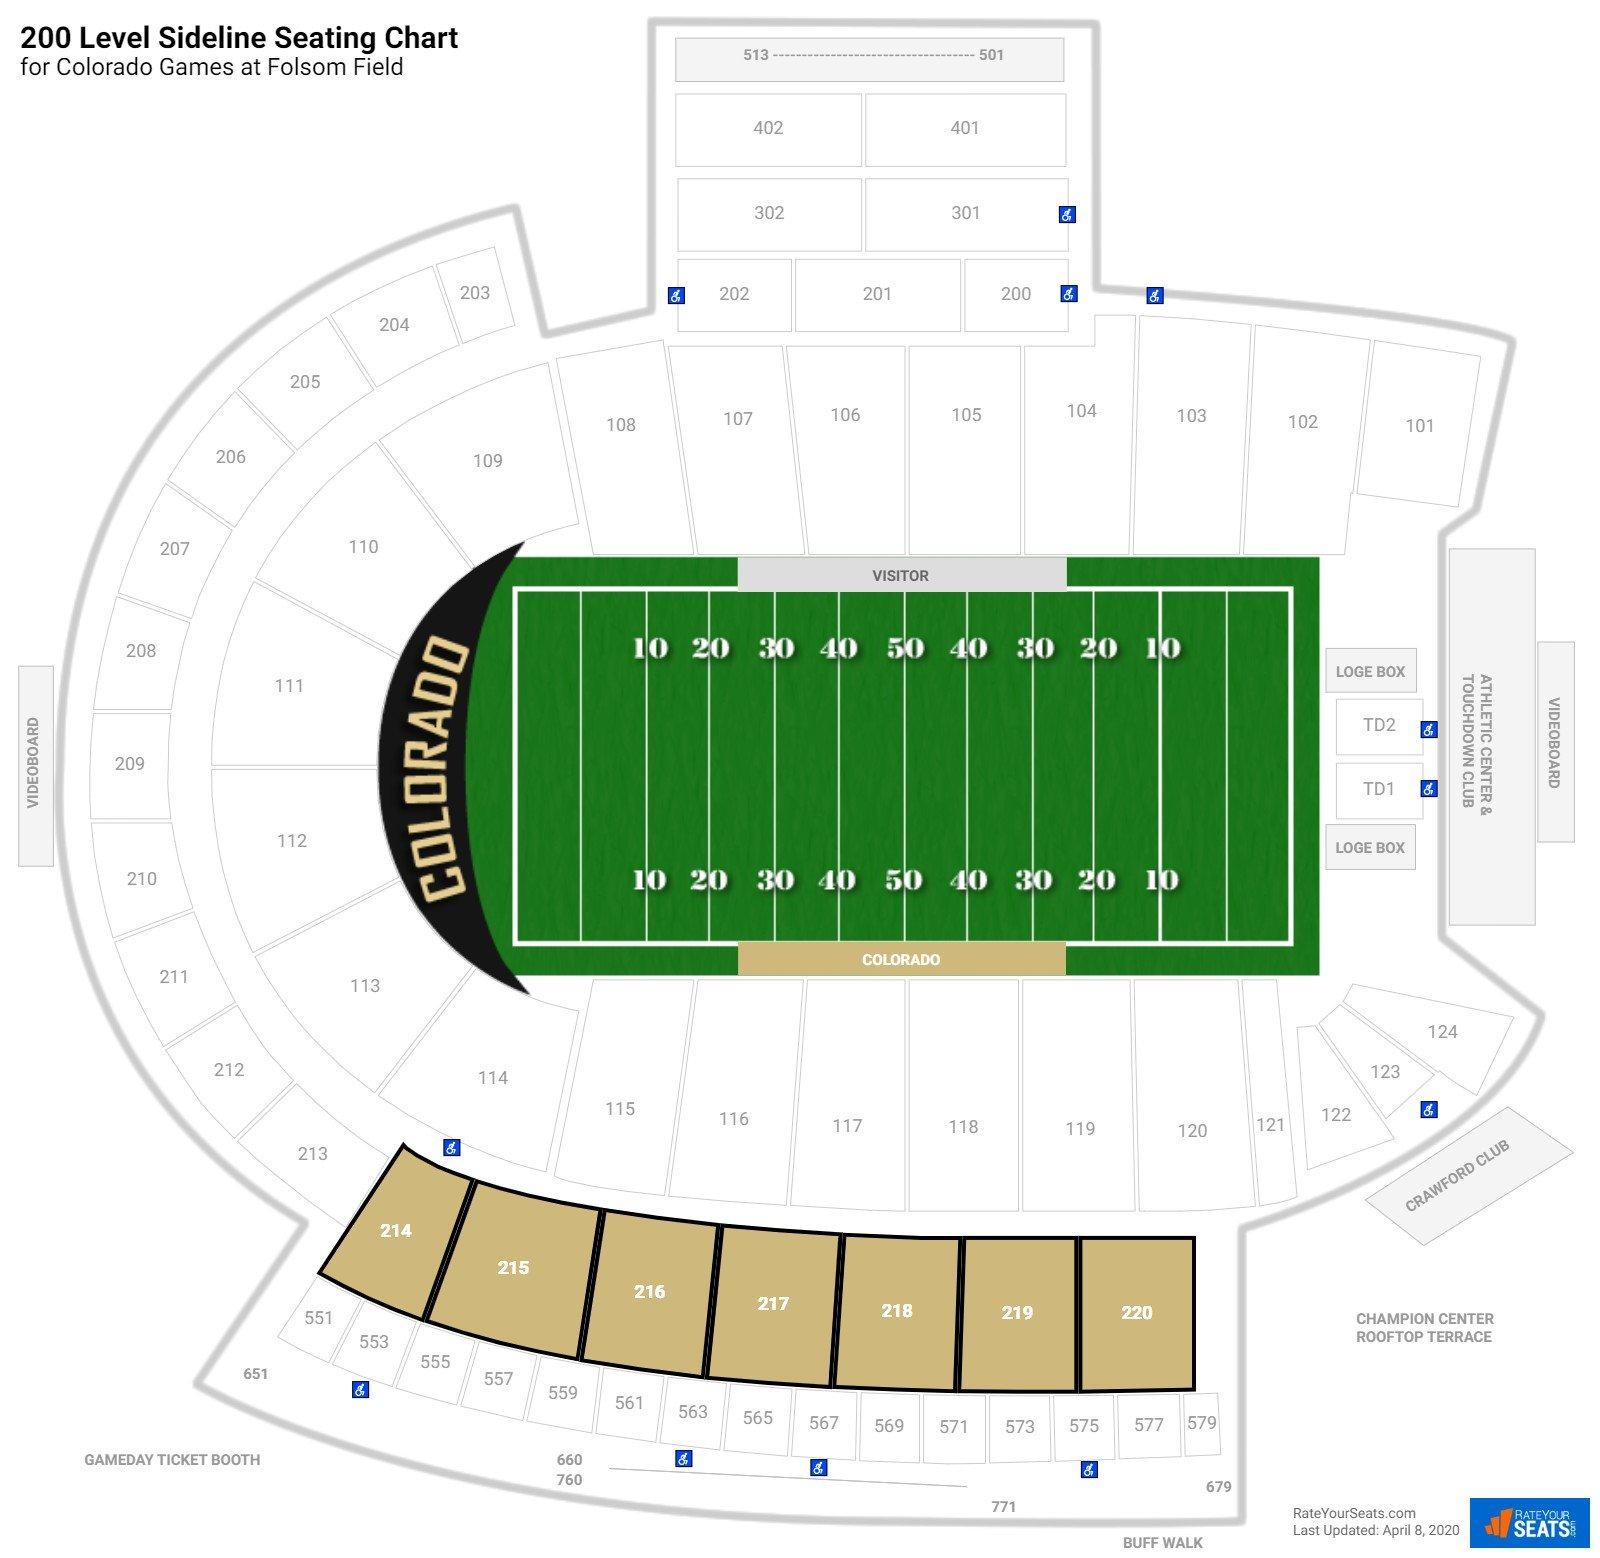 folsom field   level sideline seating chart. folsom field (colorado) seating guide  rateyourseatscom